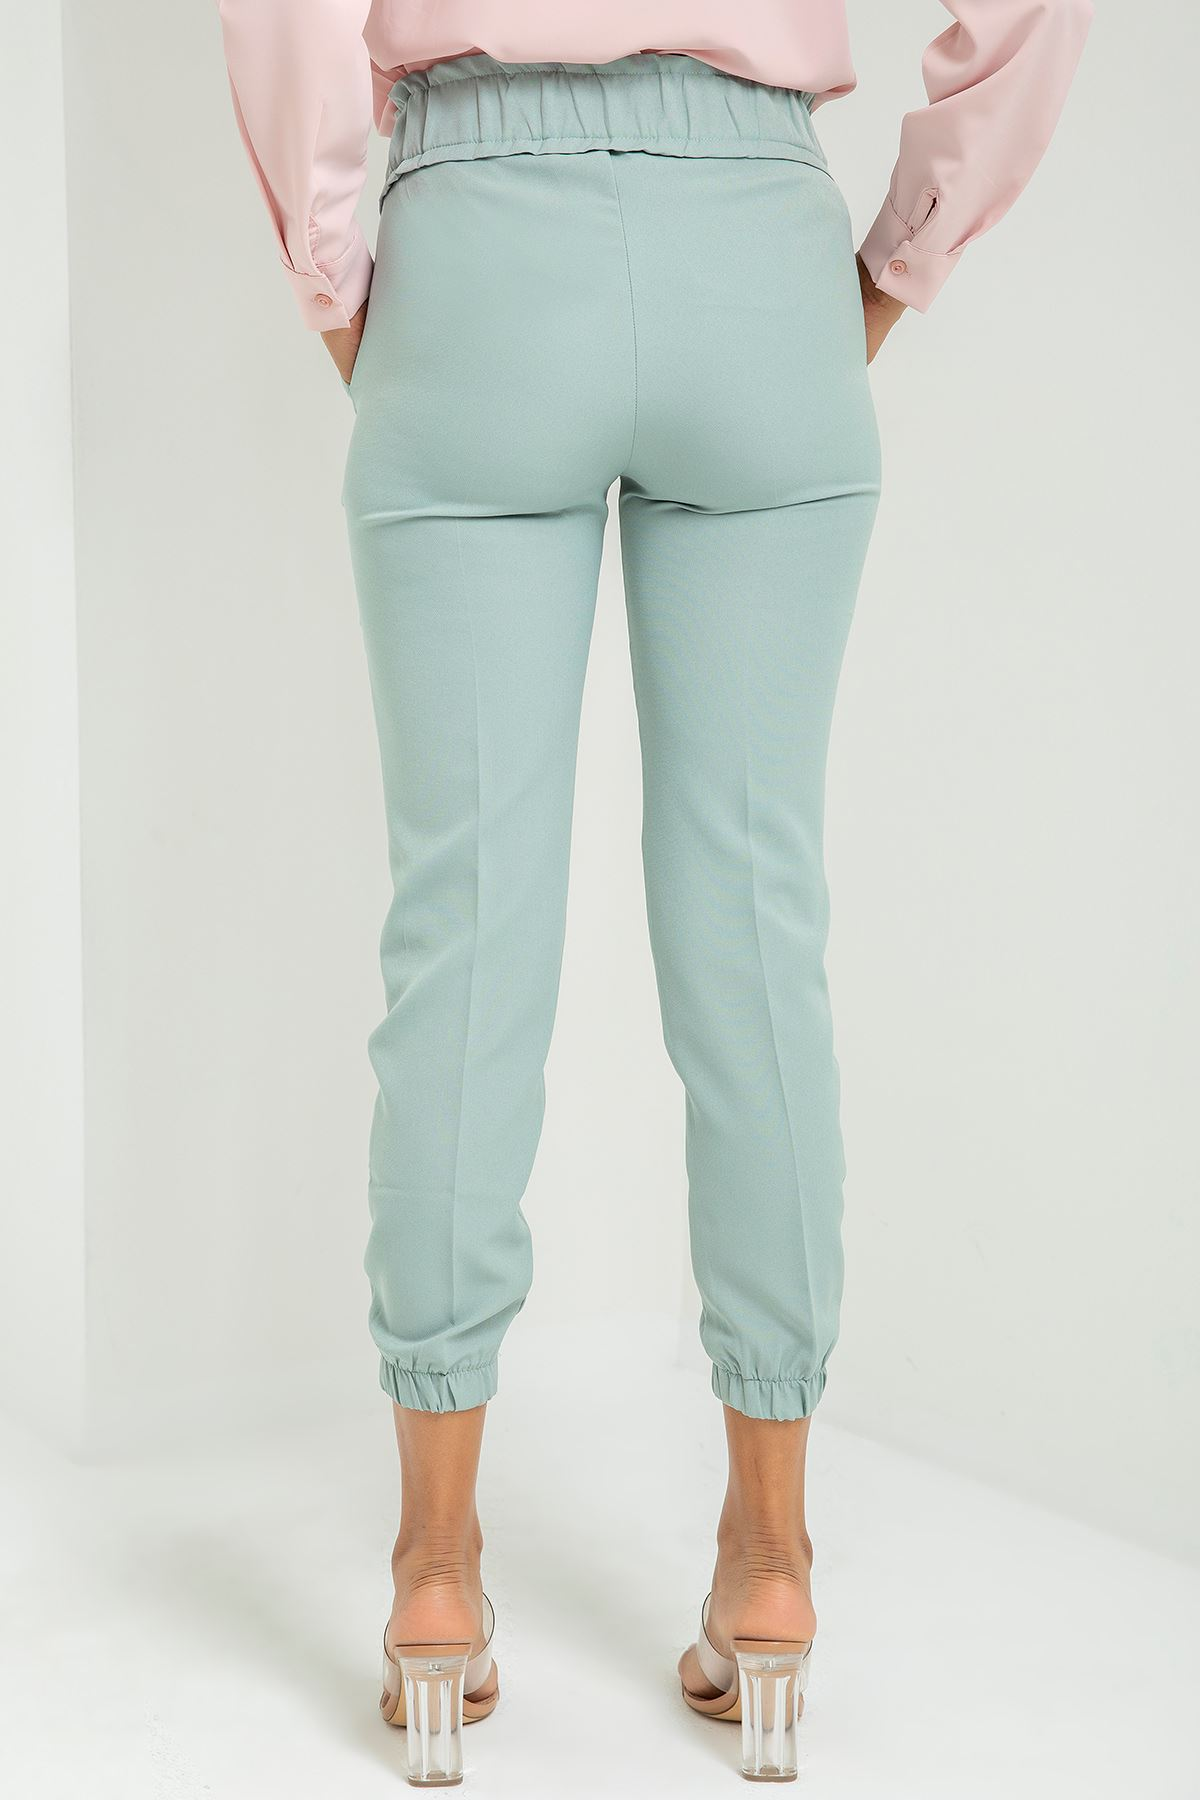 Beli Lastikli Atlas Kumaş Pantolon-Mint